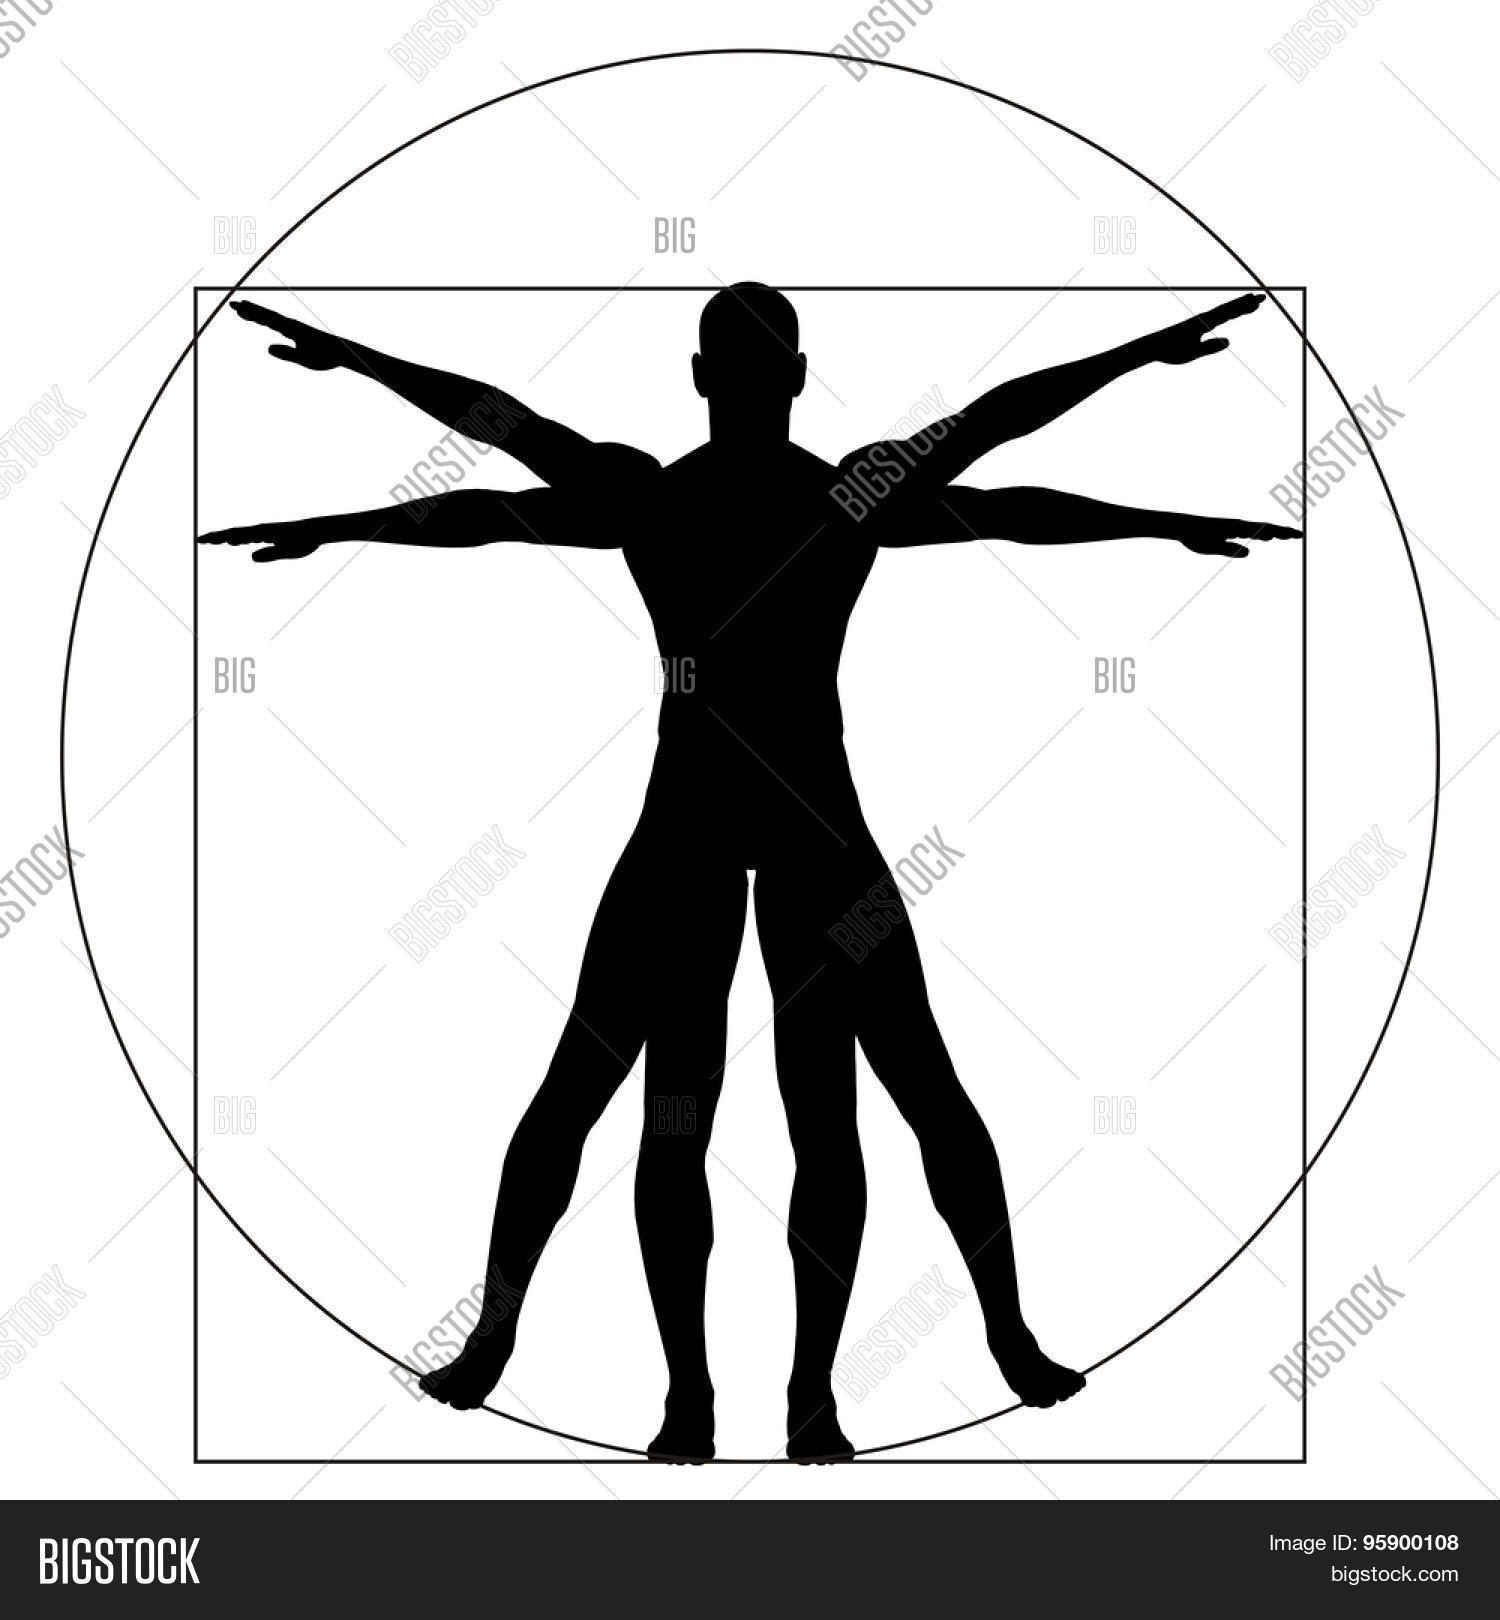 Vitruvian Human Man Image & Photo (Free Trial) | Bigstock